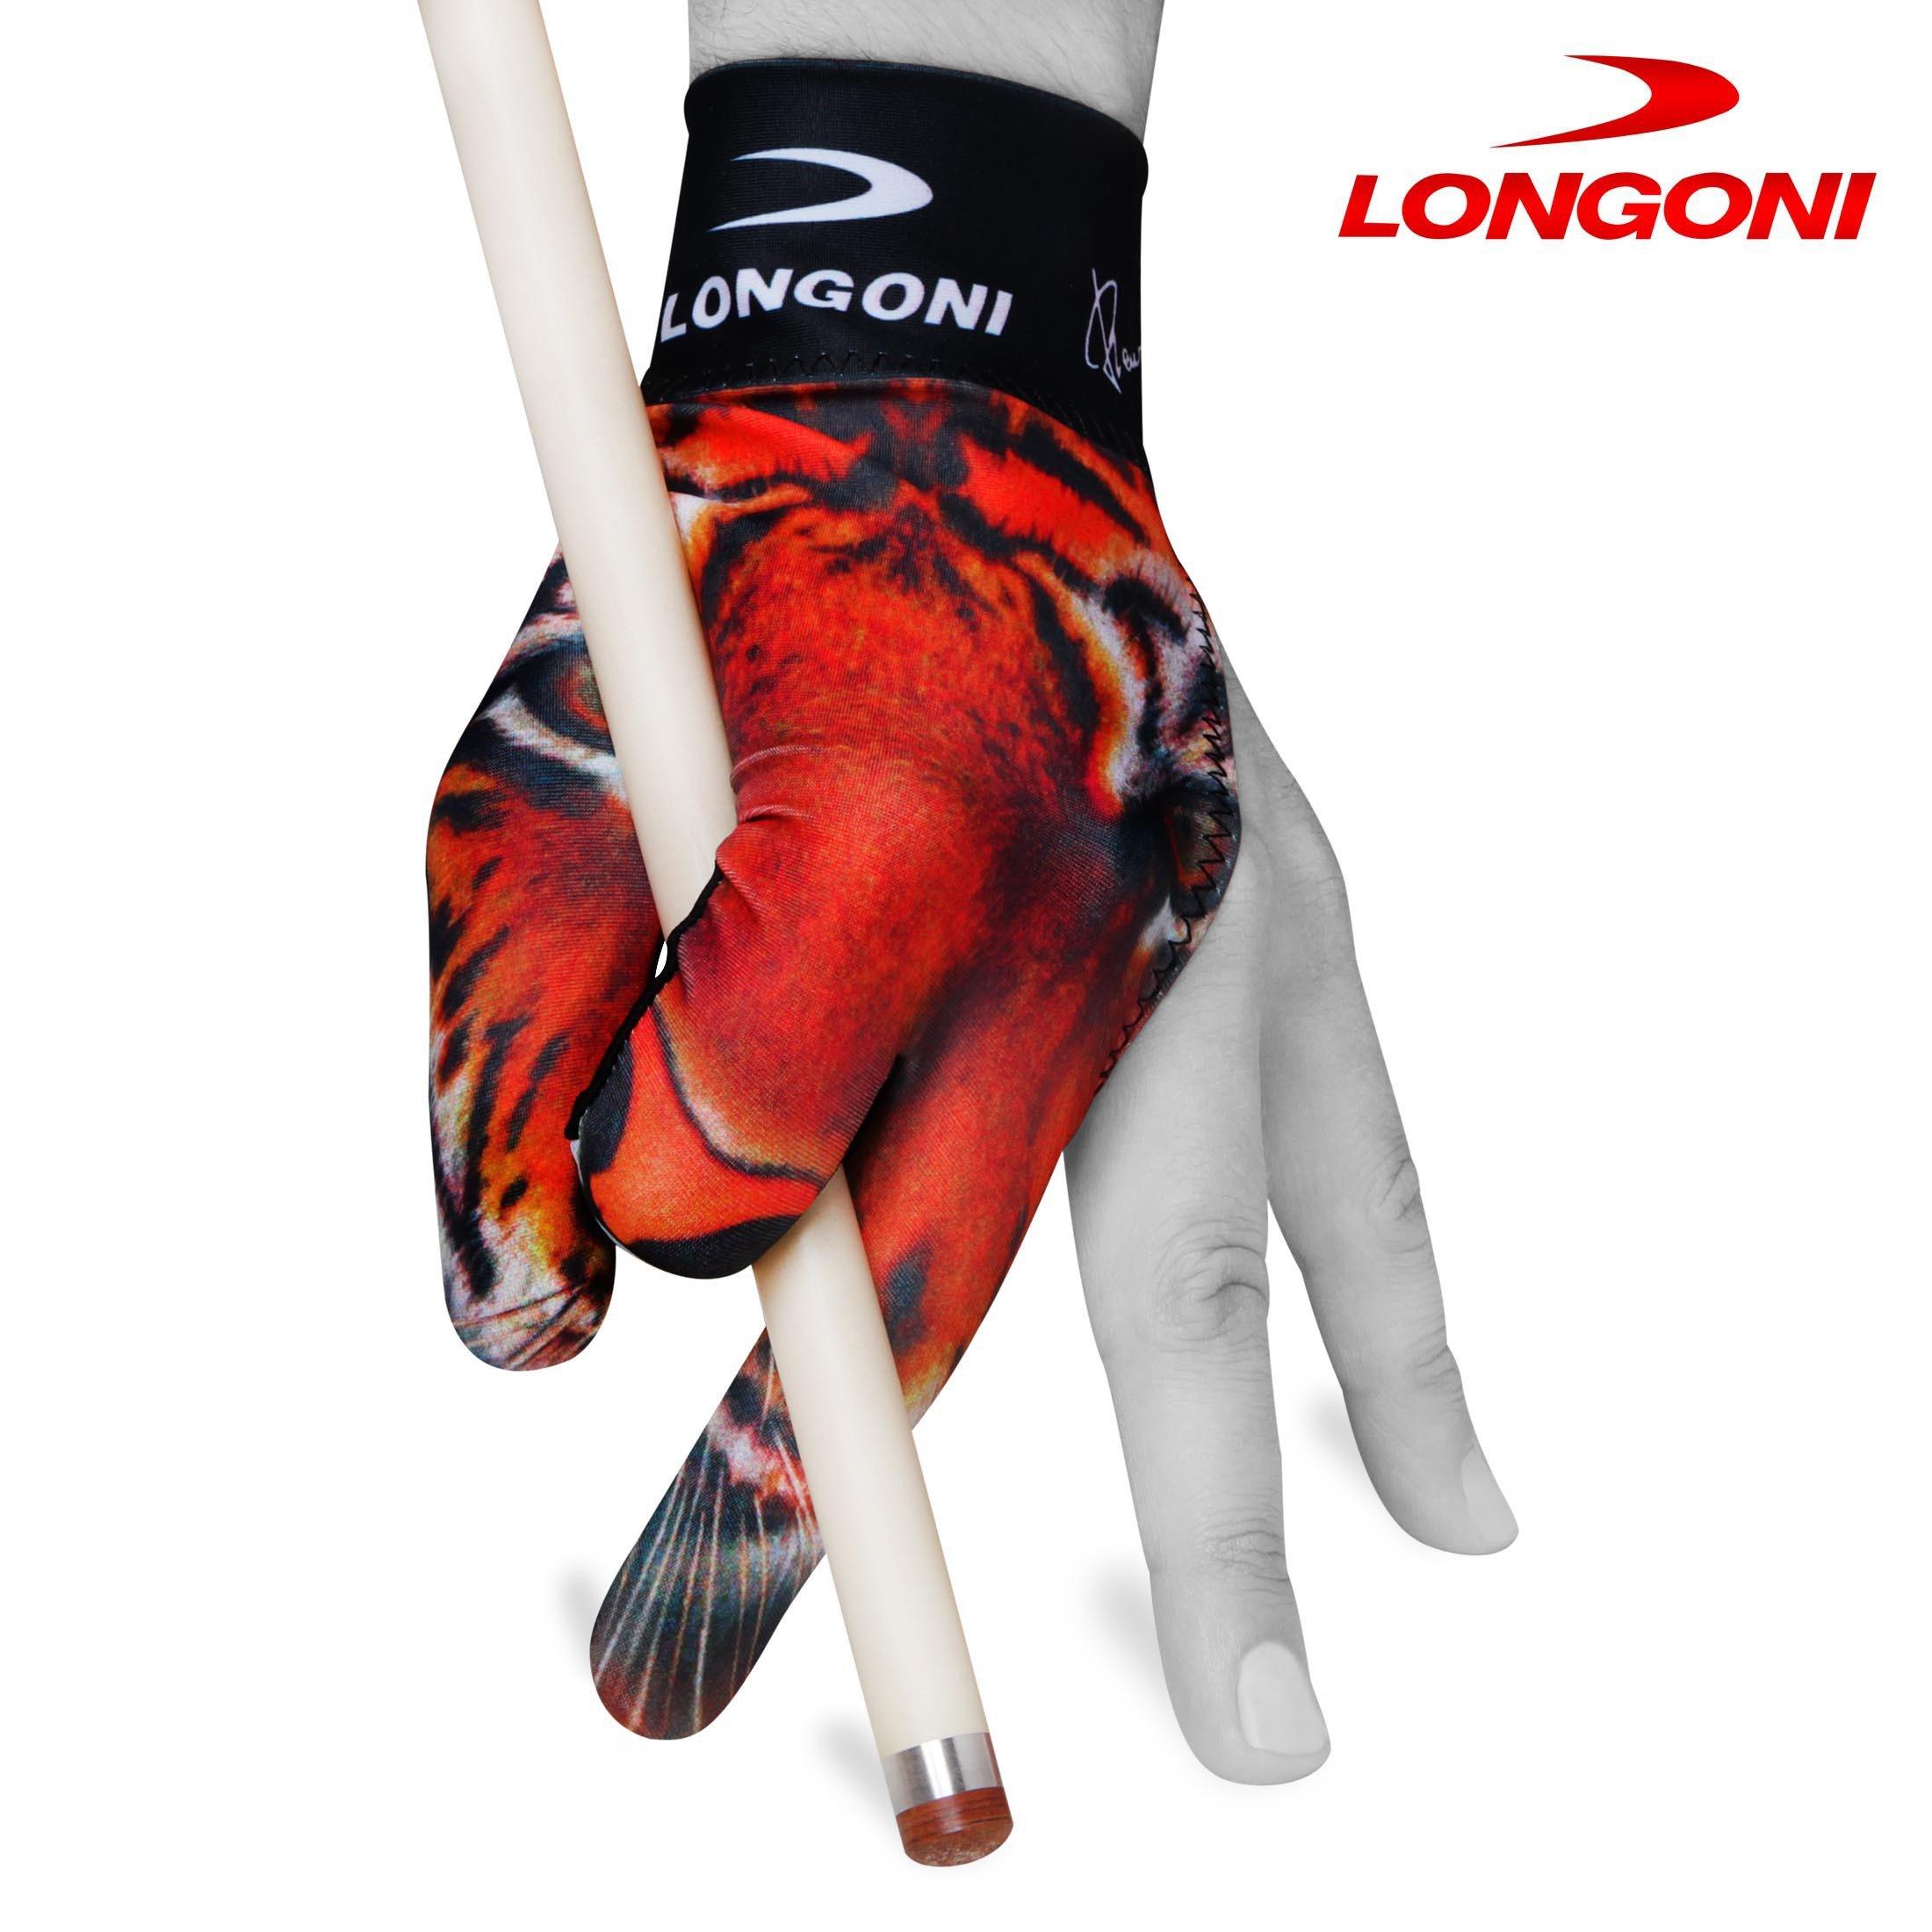 LONGONI Billiard POOL CUE GLOVE Tiger for Left hand